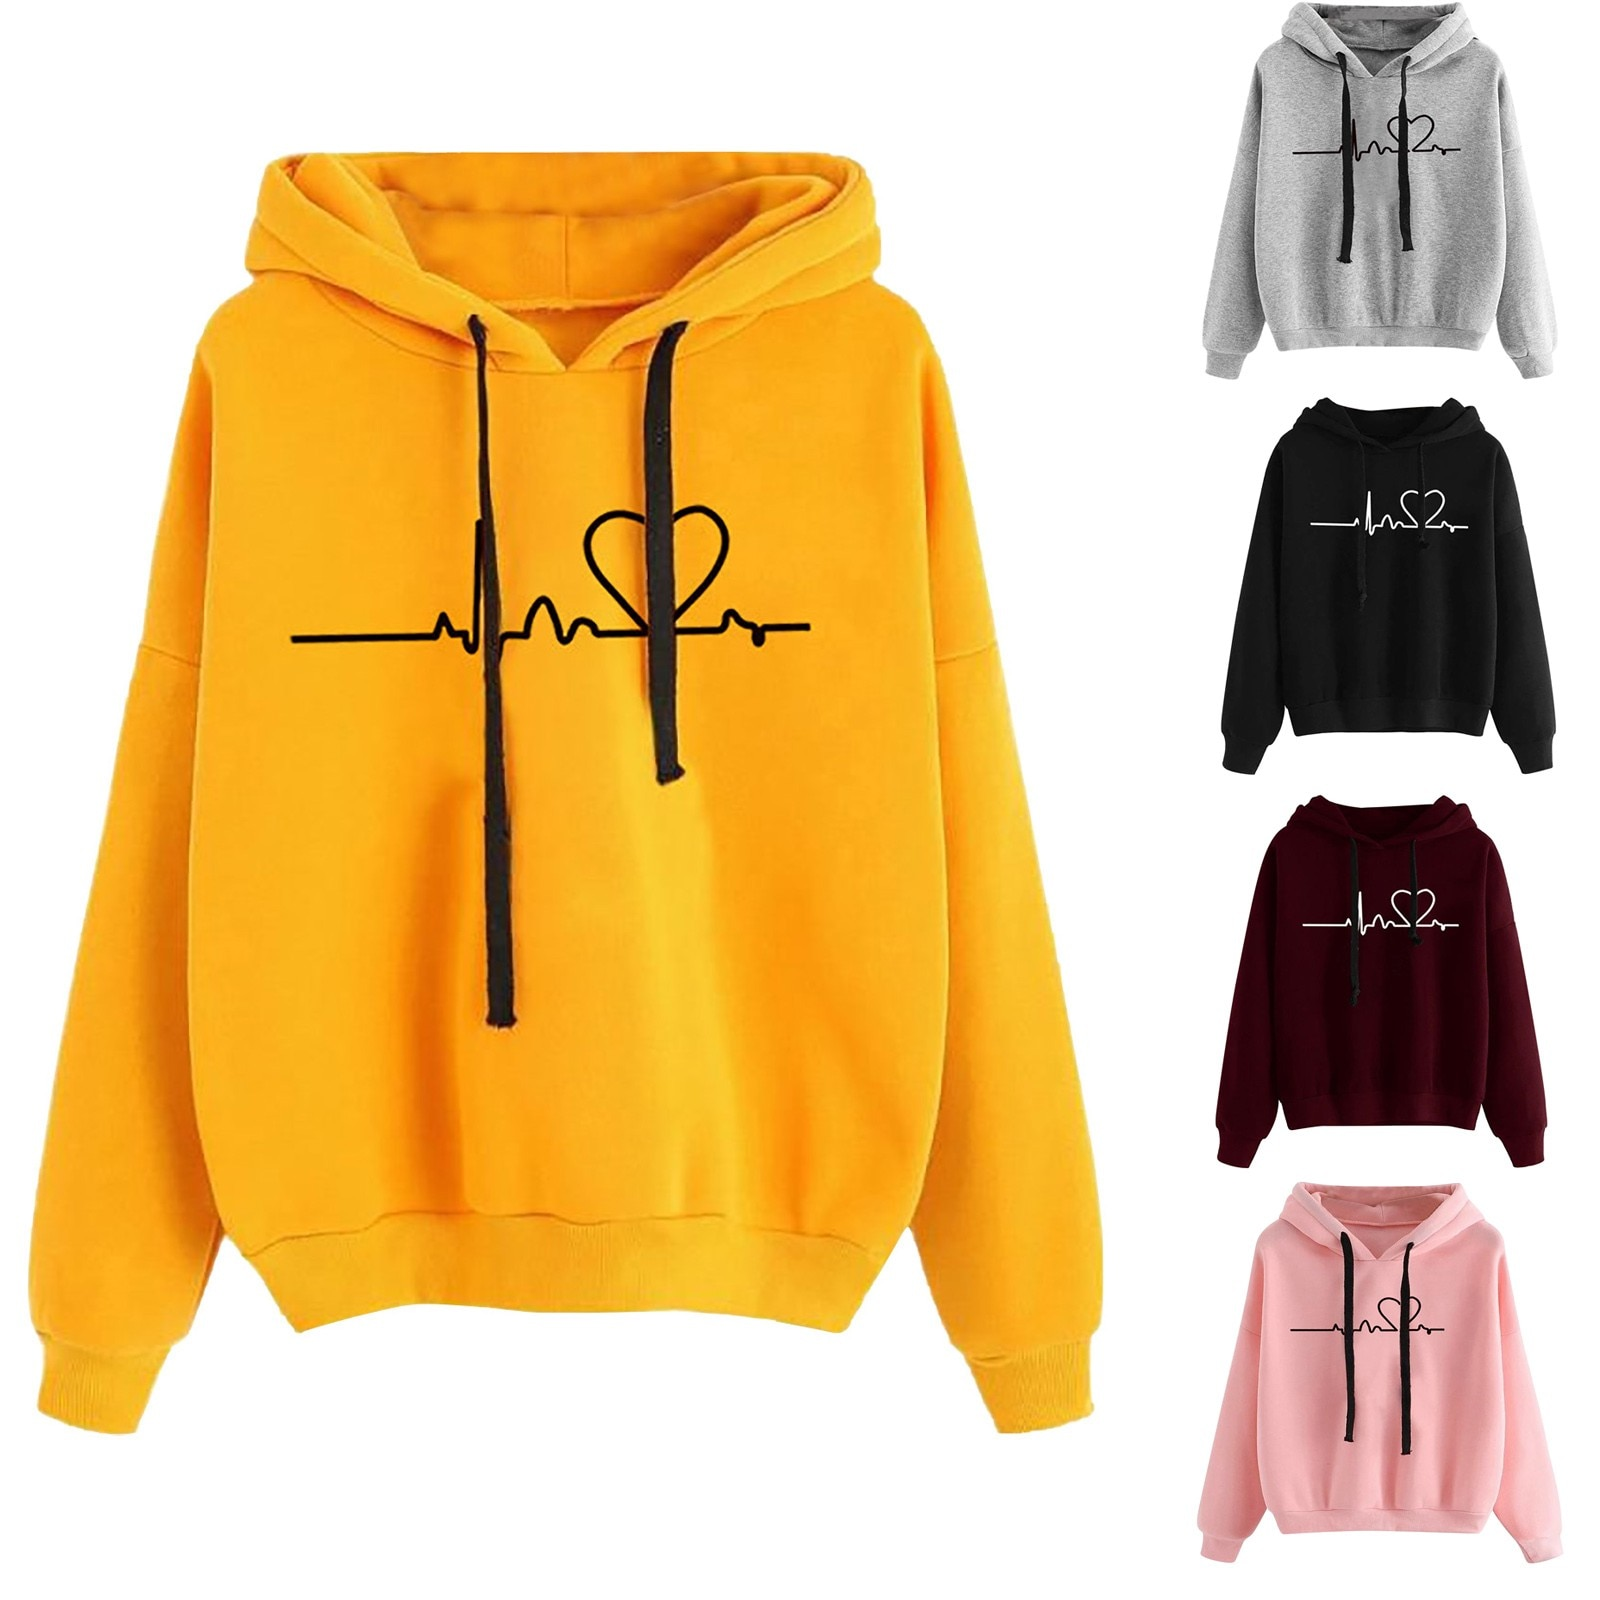 2020 Fashion Women Sweatshirt Casual Love Printsudadera mujer Women's Autumn Winter Hoodie Sweatshir